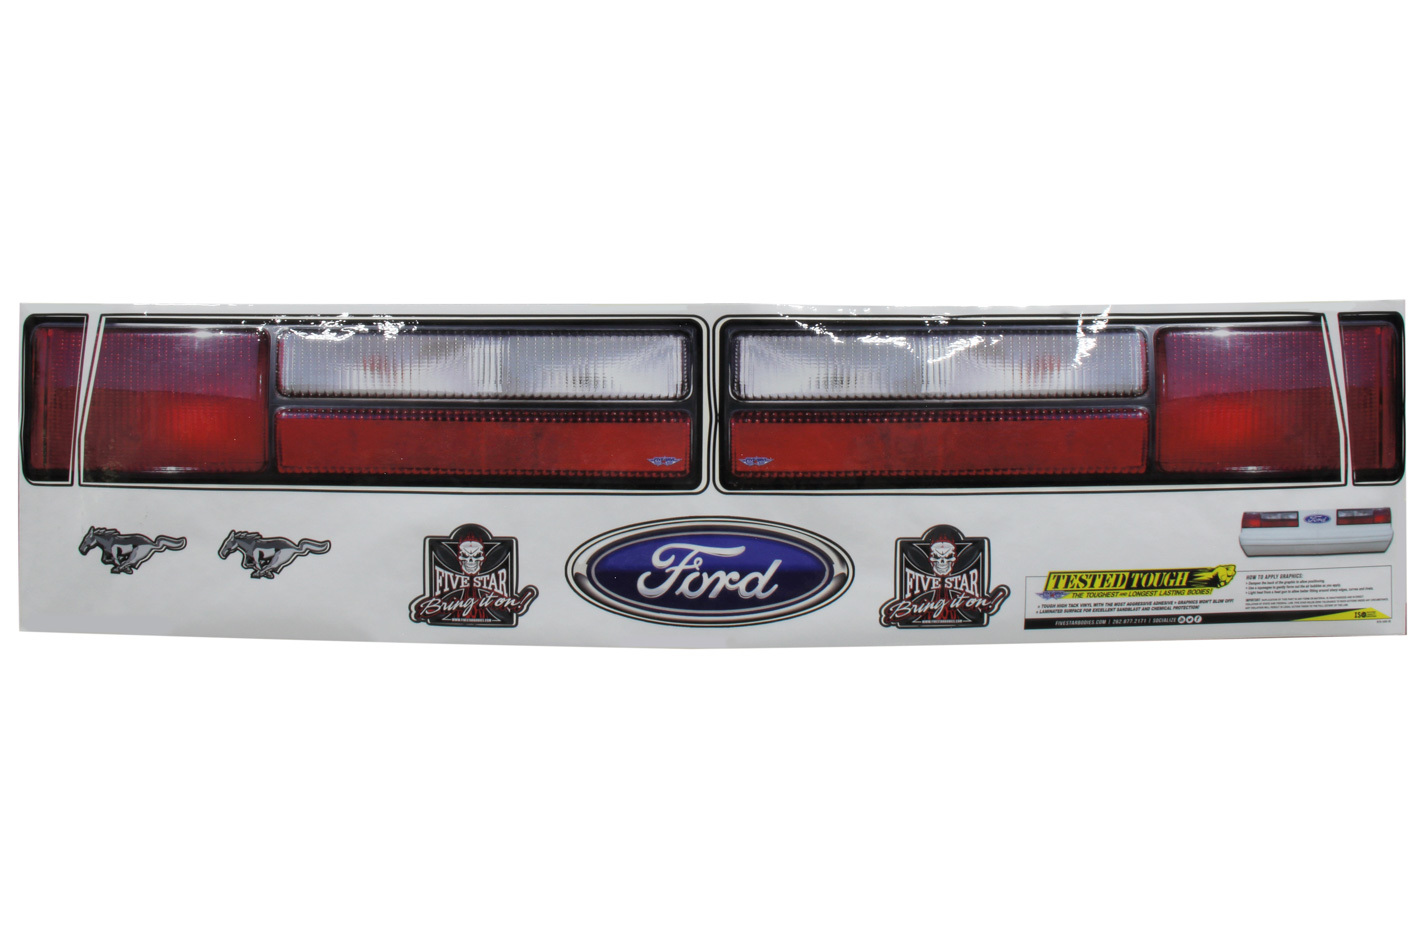 Fivestar Mustang Tail Graphics